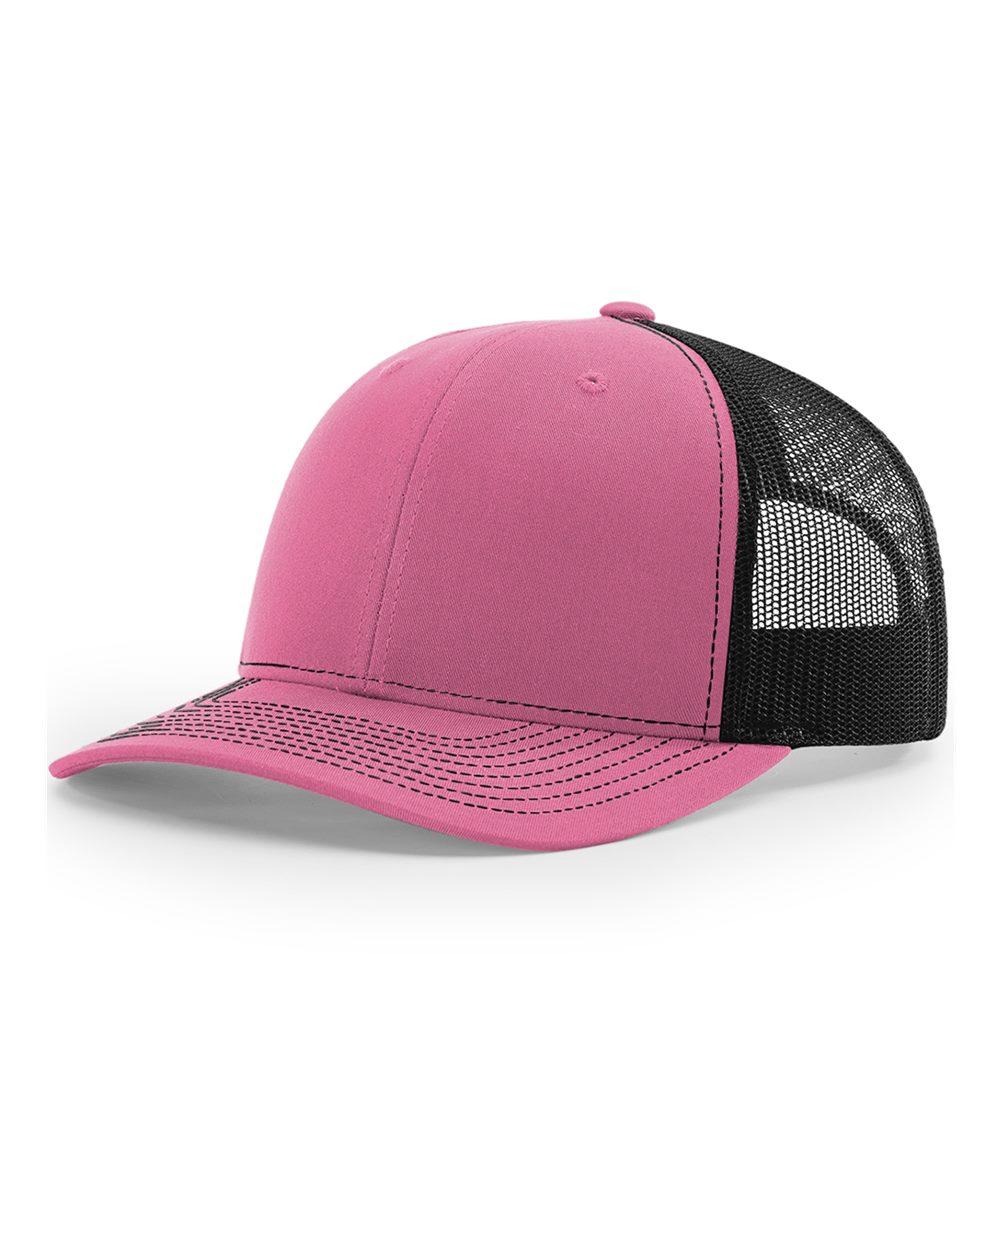 Hot Pink/ Black